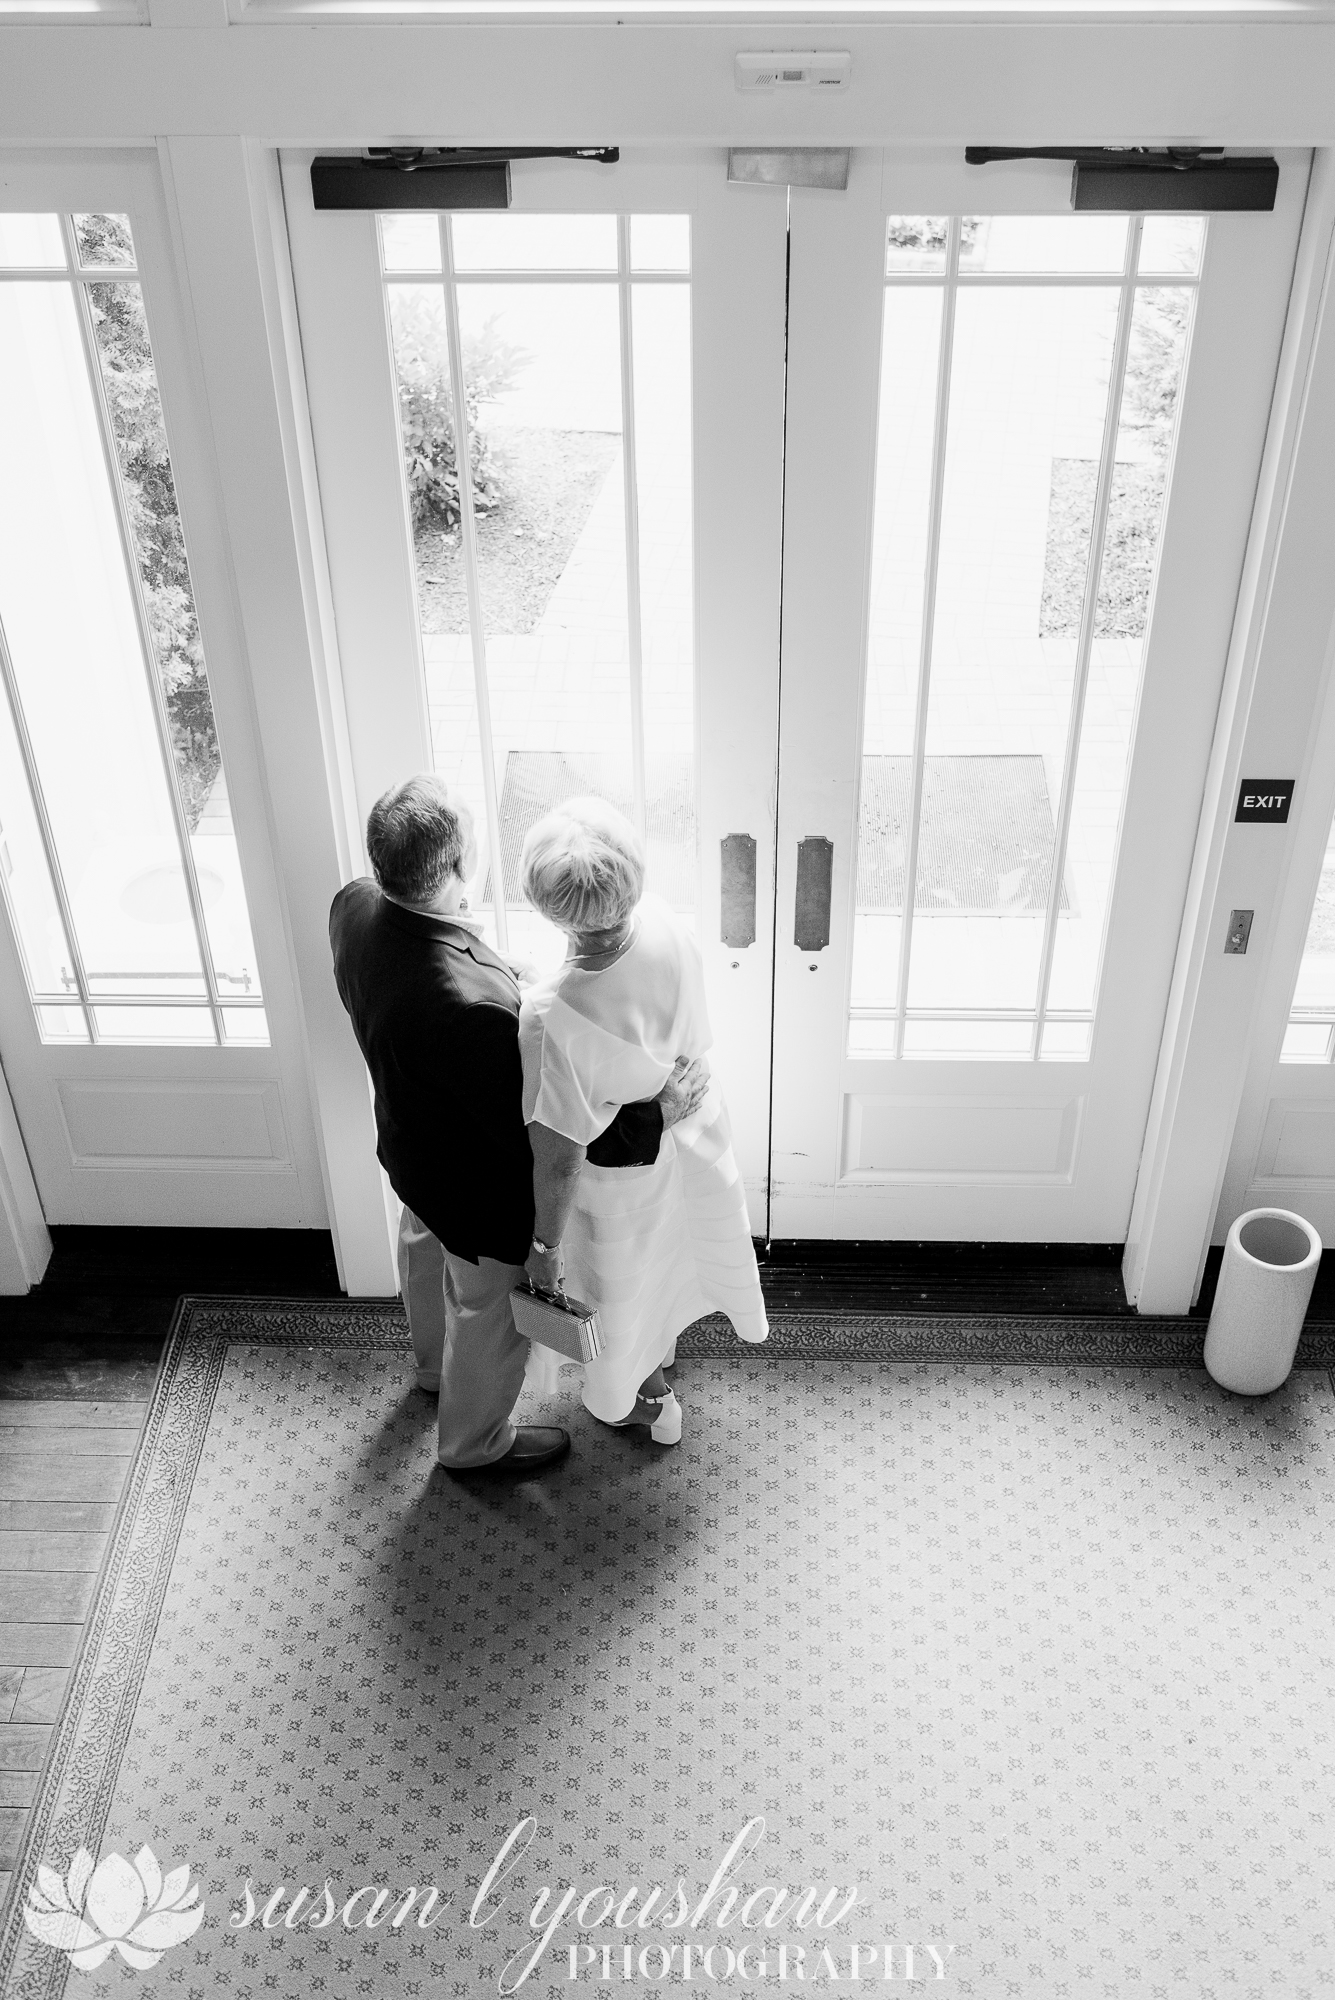 BLOG Carolyn Adams and Jim McCune 07-04-2018 SLY Photography-35.jpg